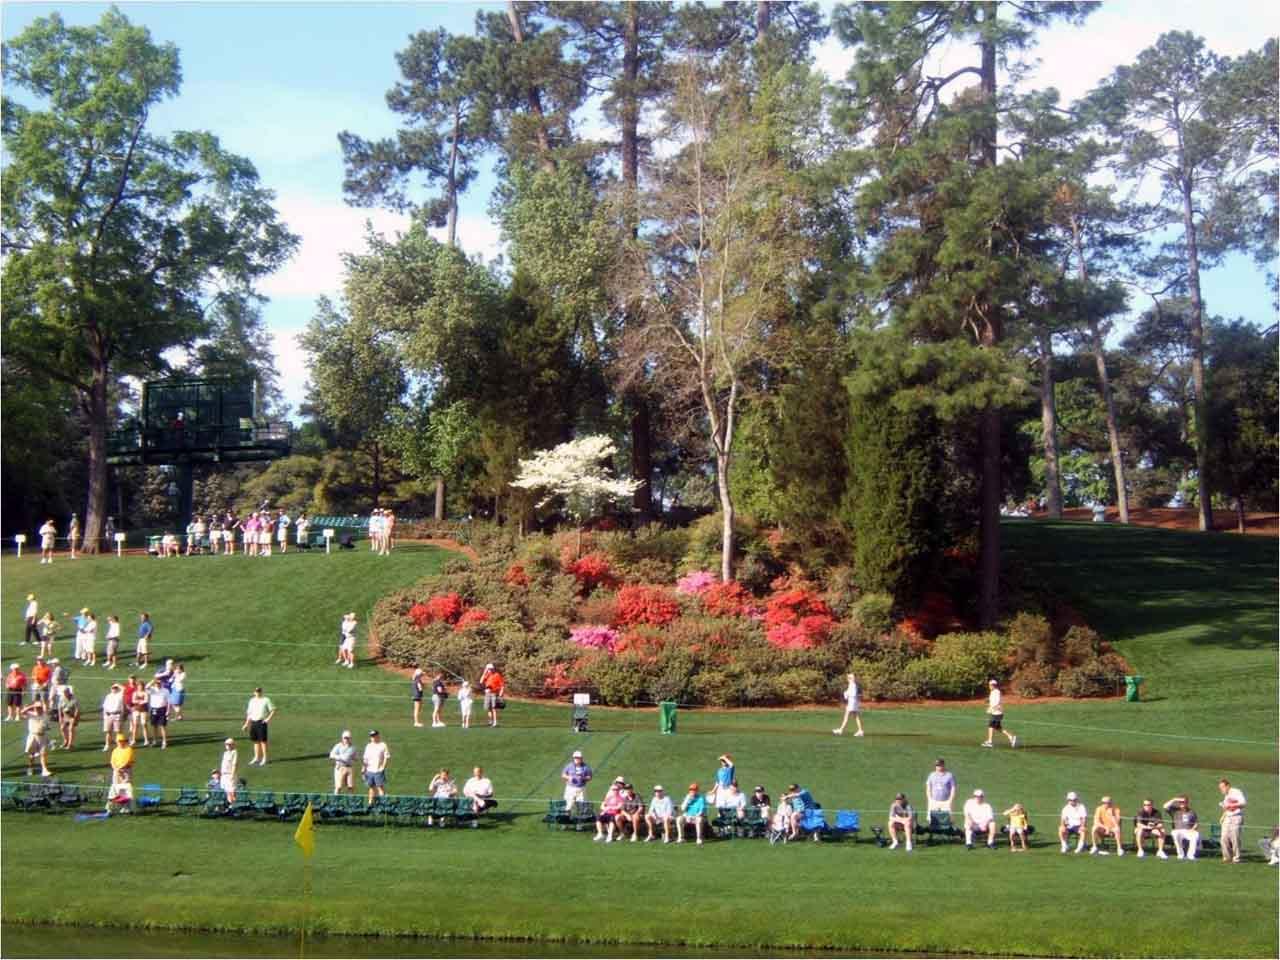 die vier major golf turniere: us masters - u.s. open - open